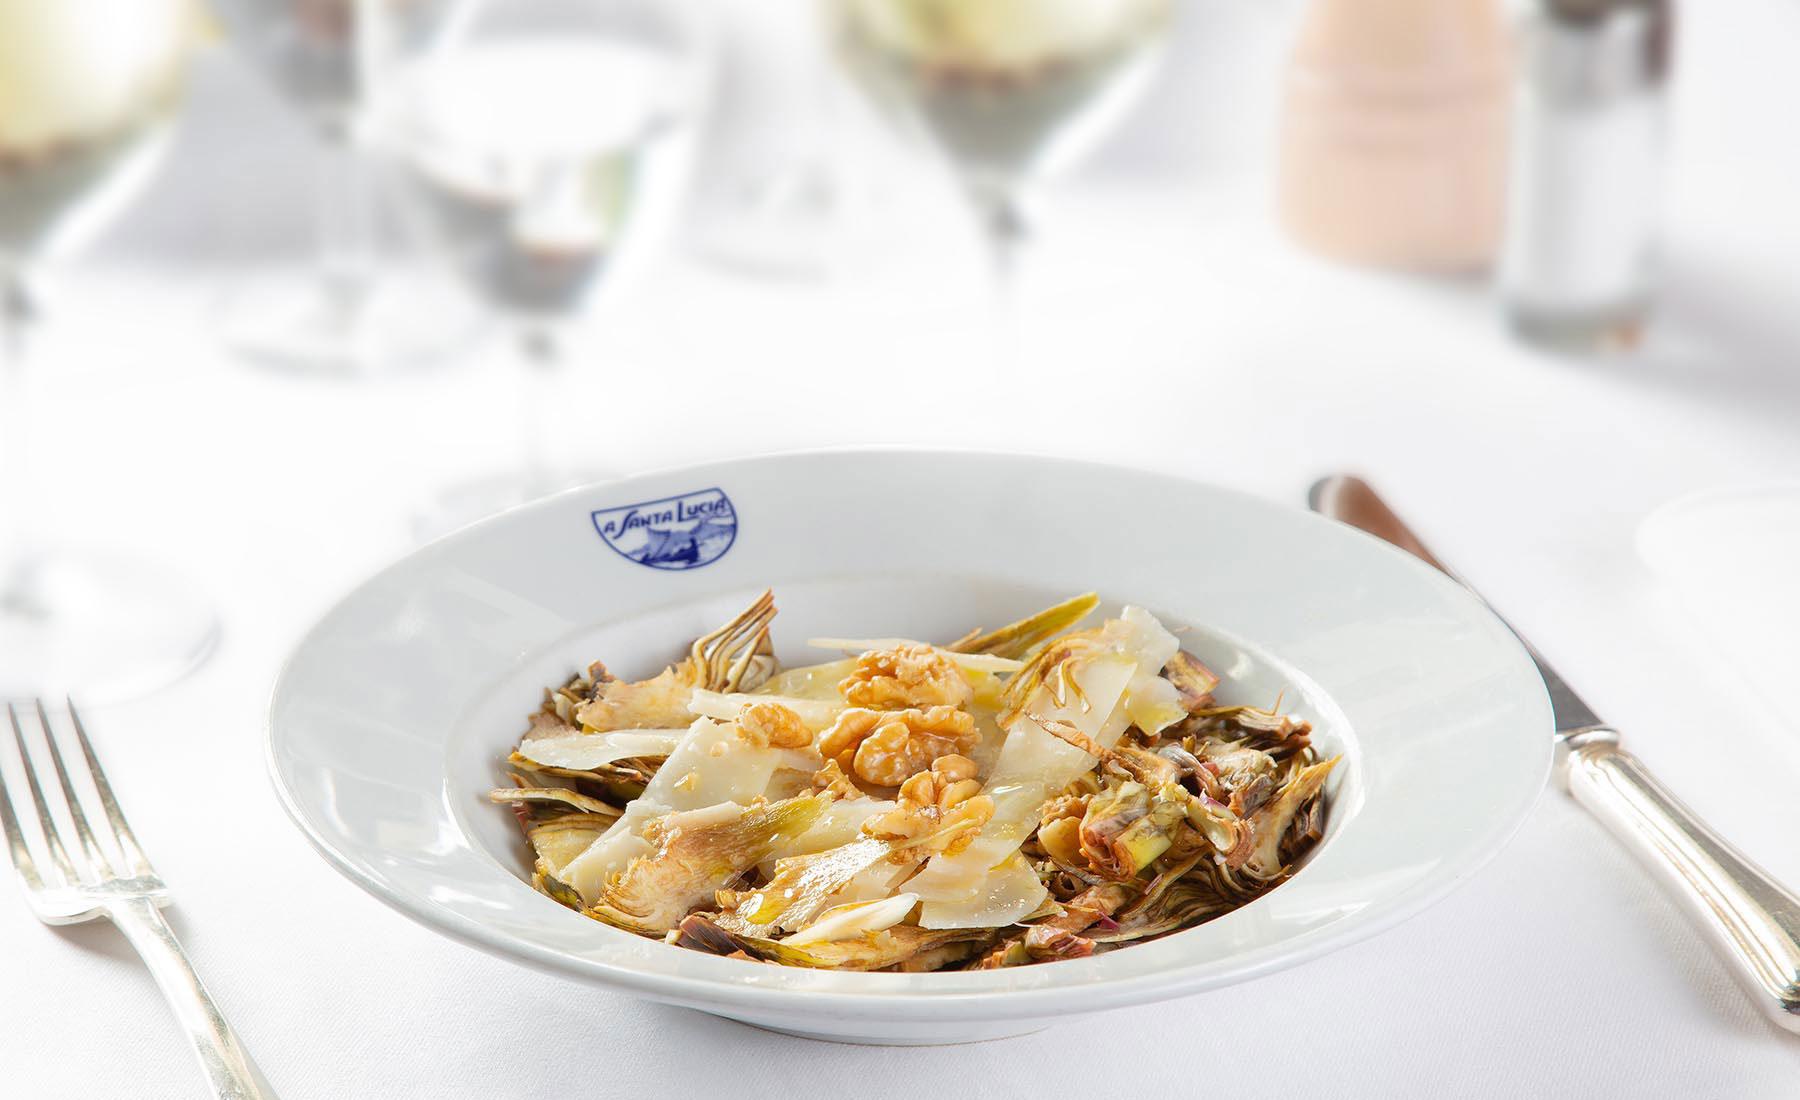 Artichokes salad with parmesan and walnuts